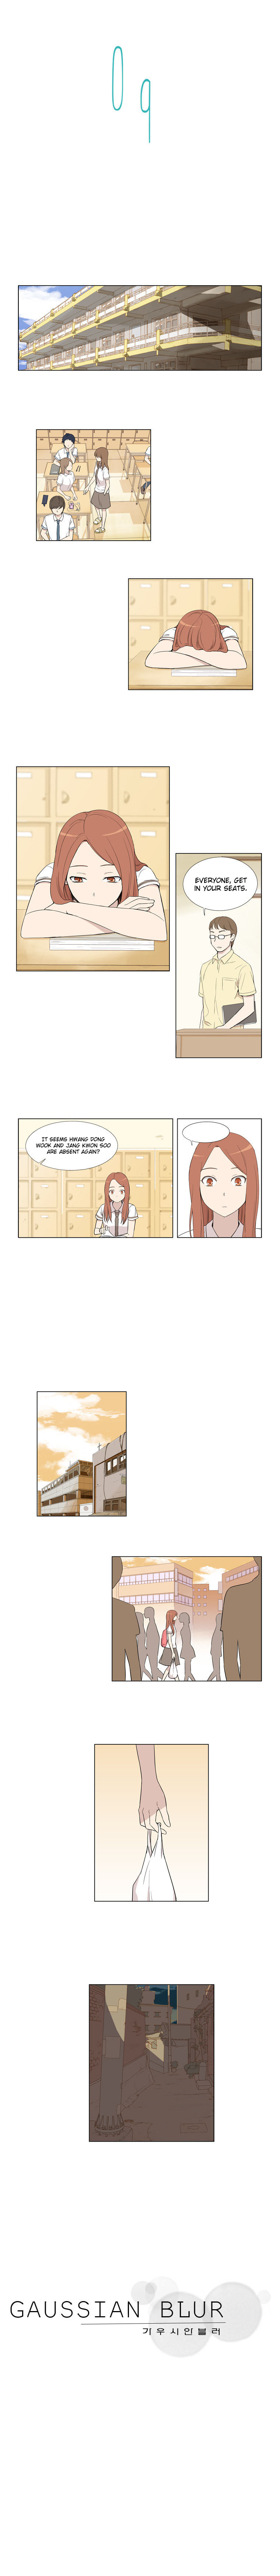 Gaussian Blur 9 Page 2